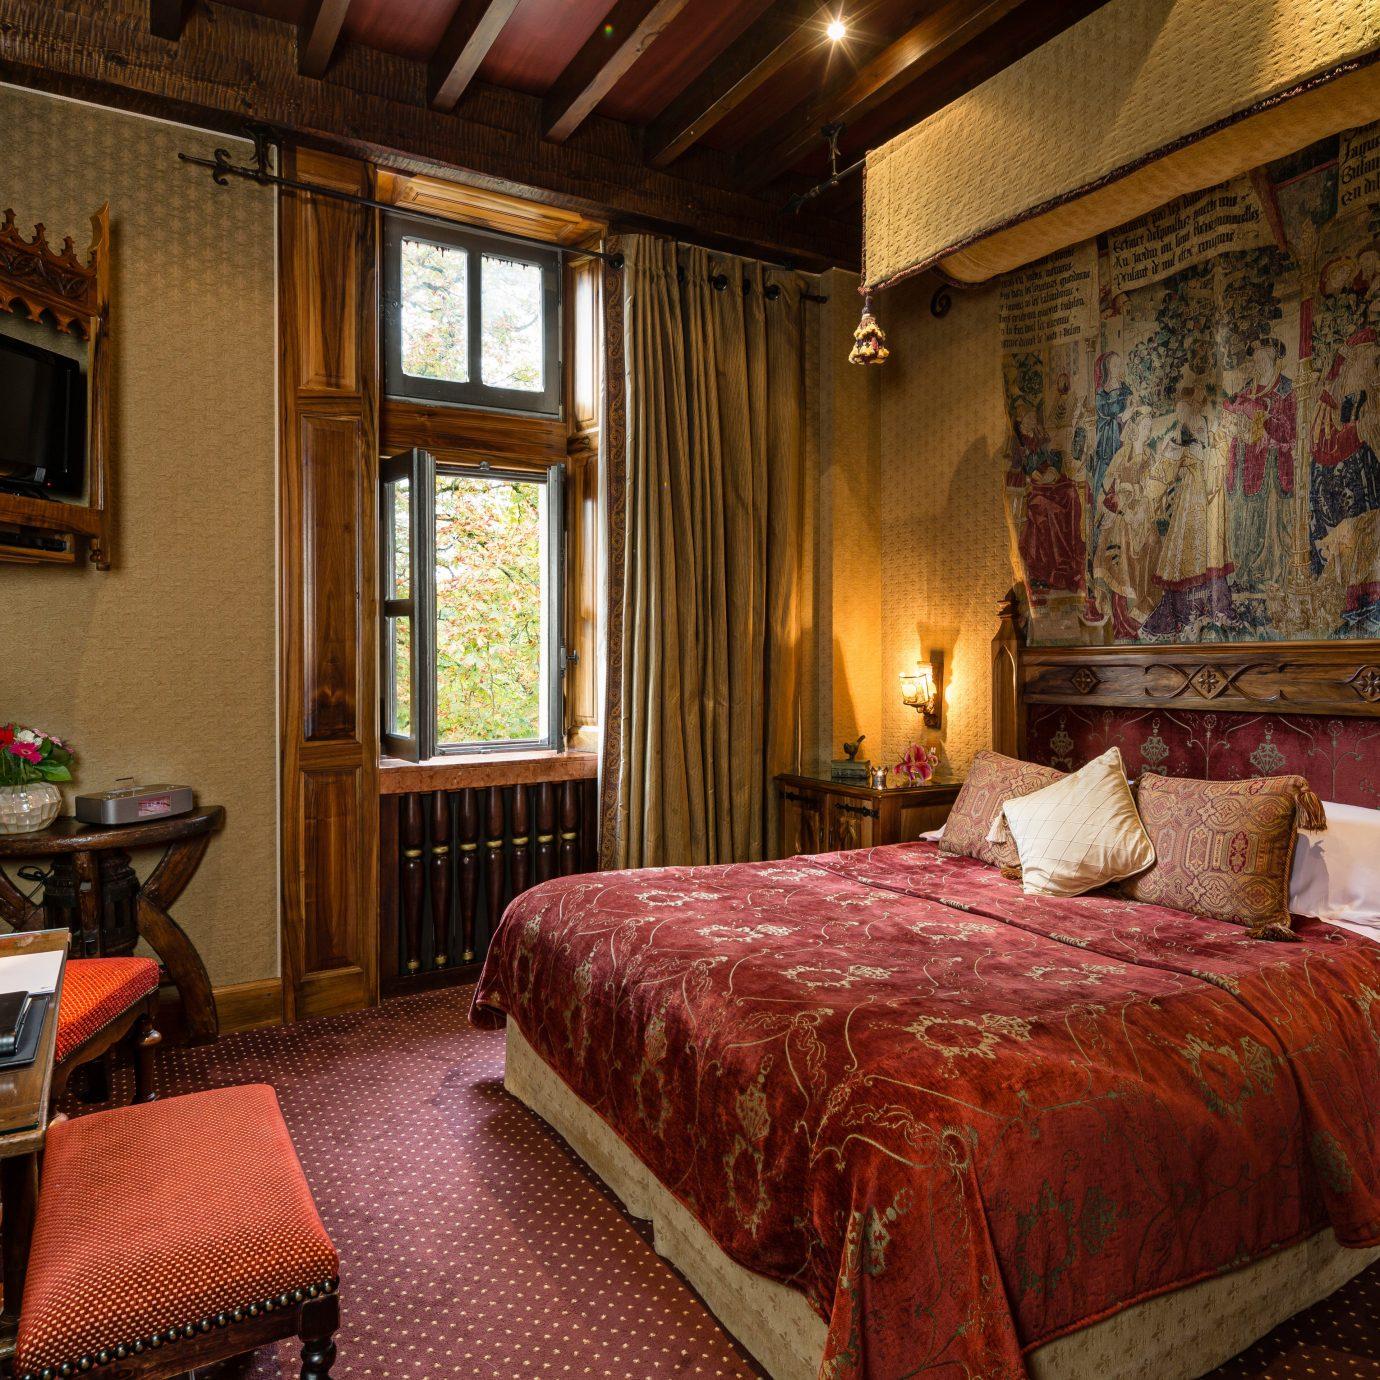 Bedroom Elegant Historic Honeymoon Luxury Romance Romantic Suite property red building home living room cottage mansion Resort